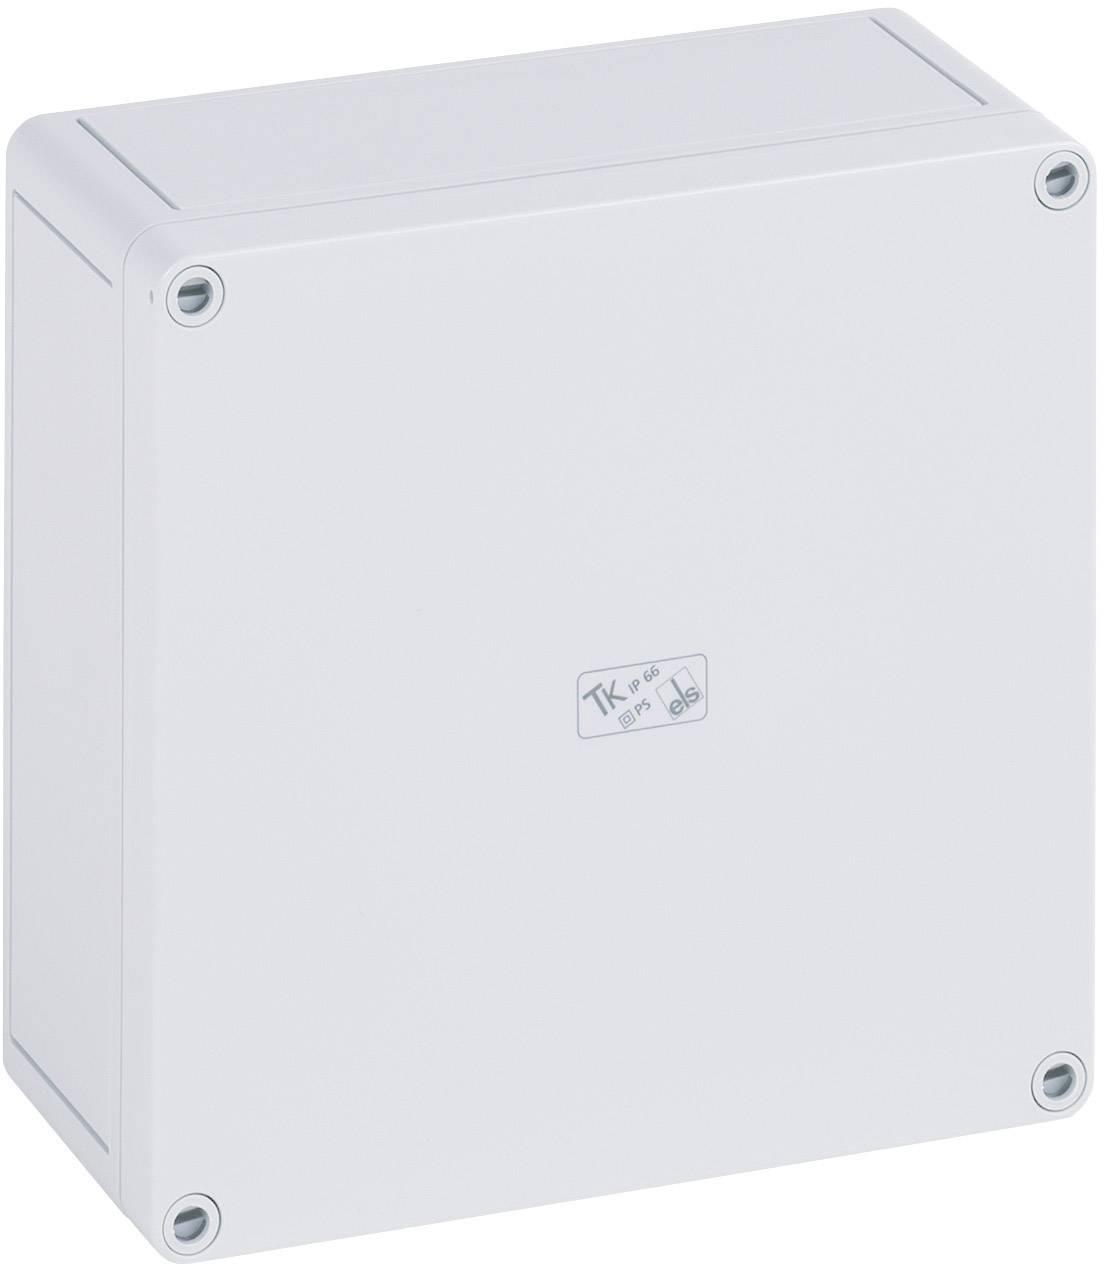 Inštalačná krabička Spelsberg TK PS 1111-9 11090401, (d x š x v) 110 x 110 x 90 mm, polystyrén, svetlo sivá (RAL 7035), 1 ks